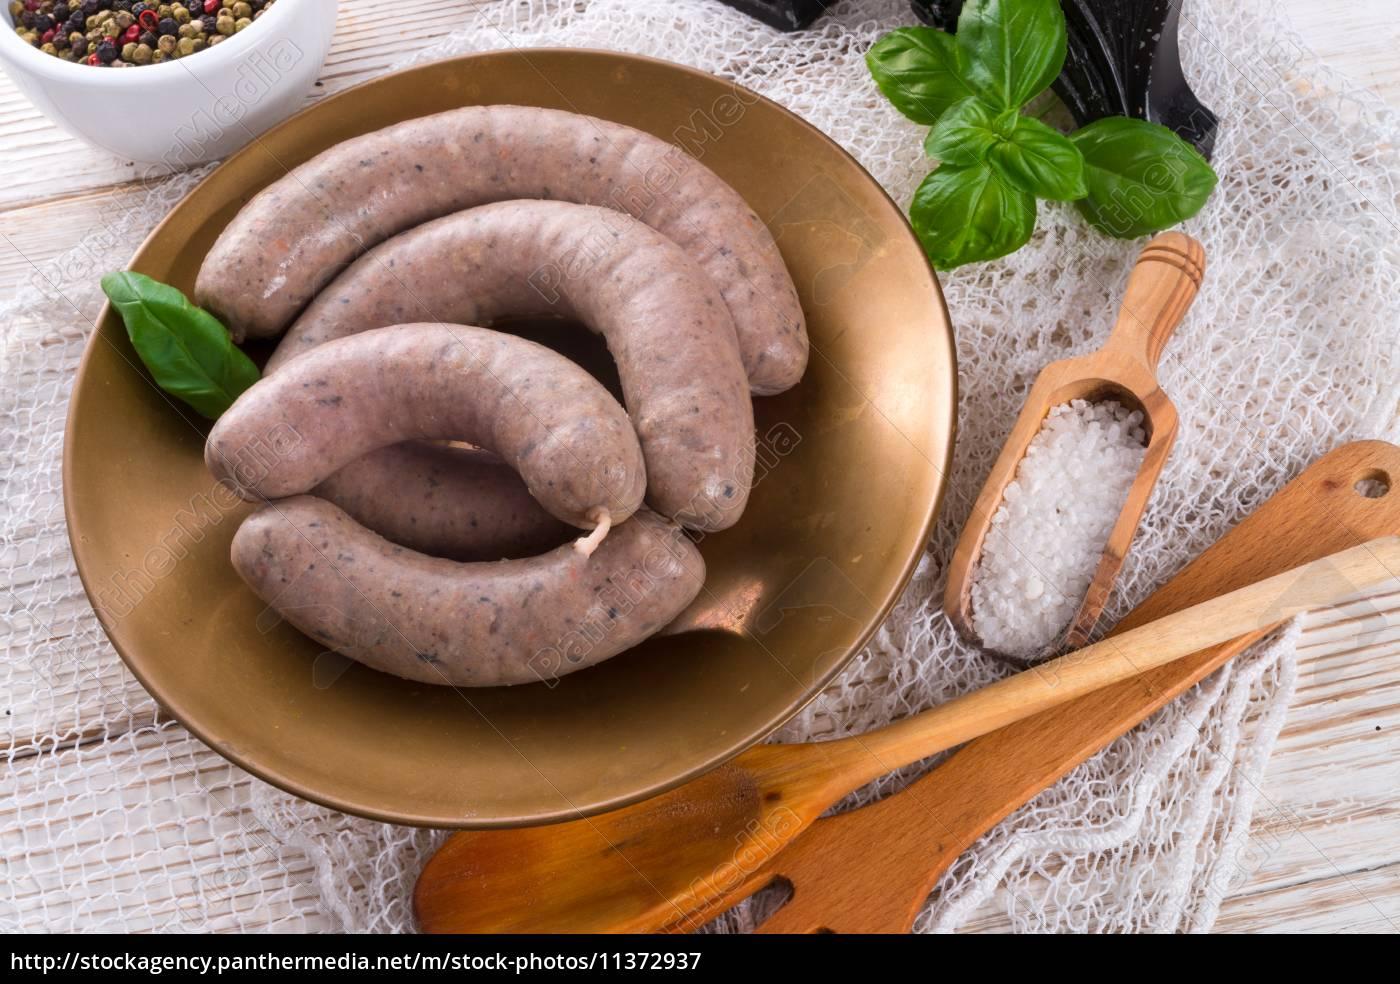 home-made, sausage - 11372937